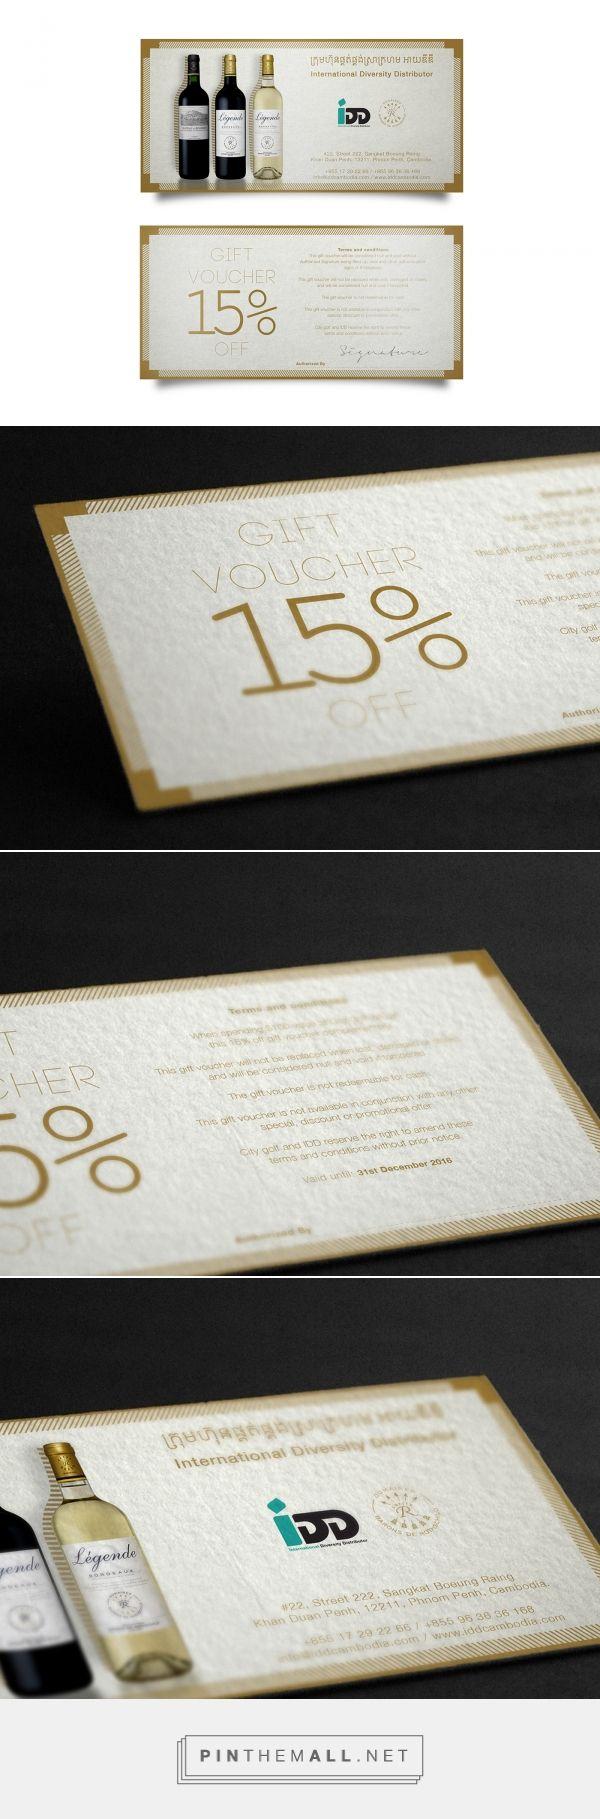 Gift Voucher Design / Complementary gift card on Behance - created via https://pinthemall.net